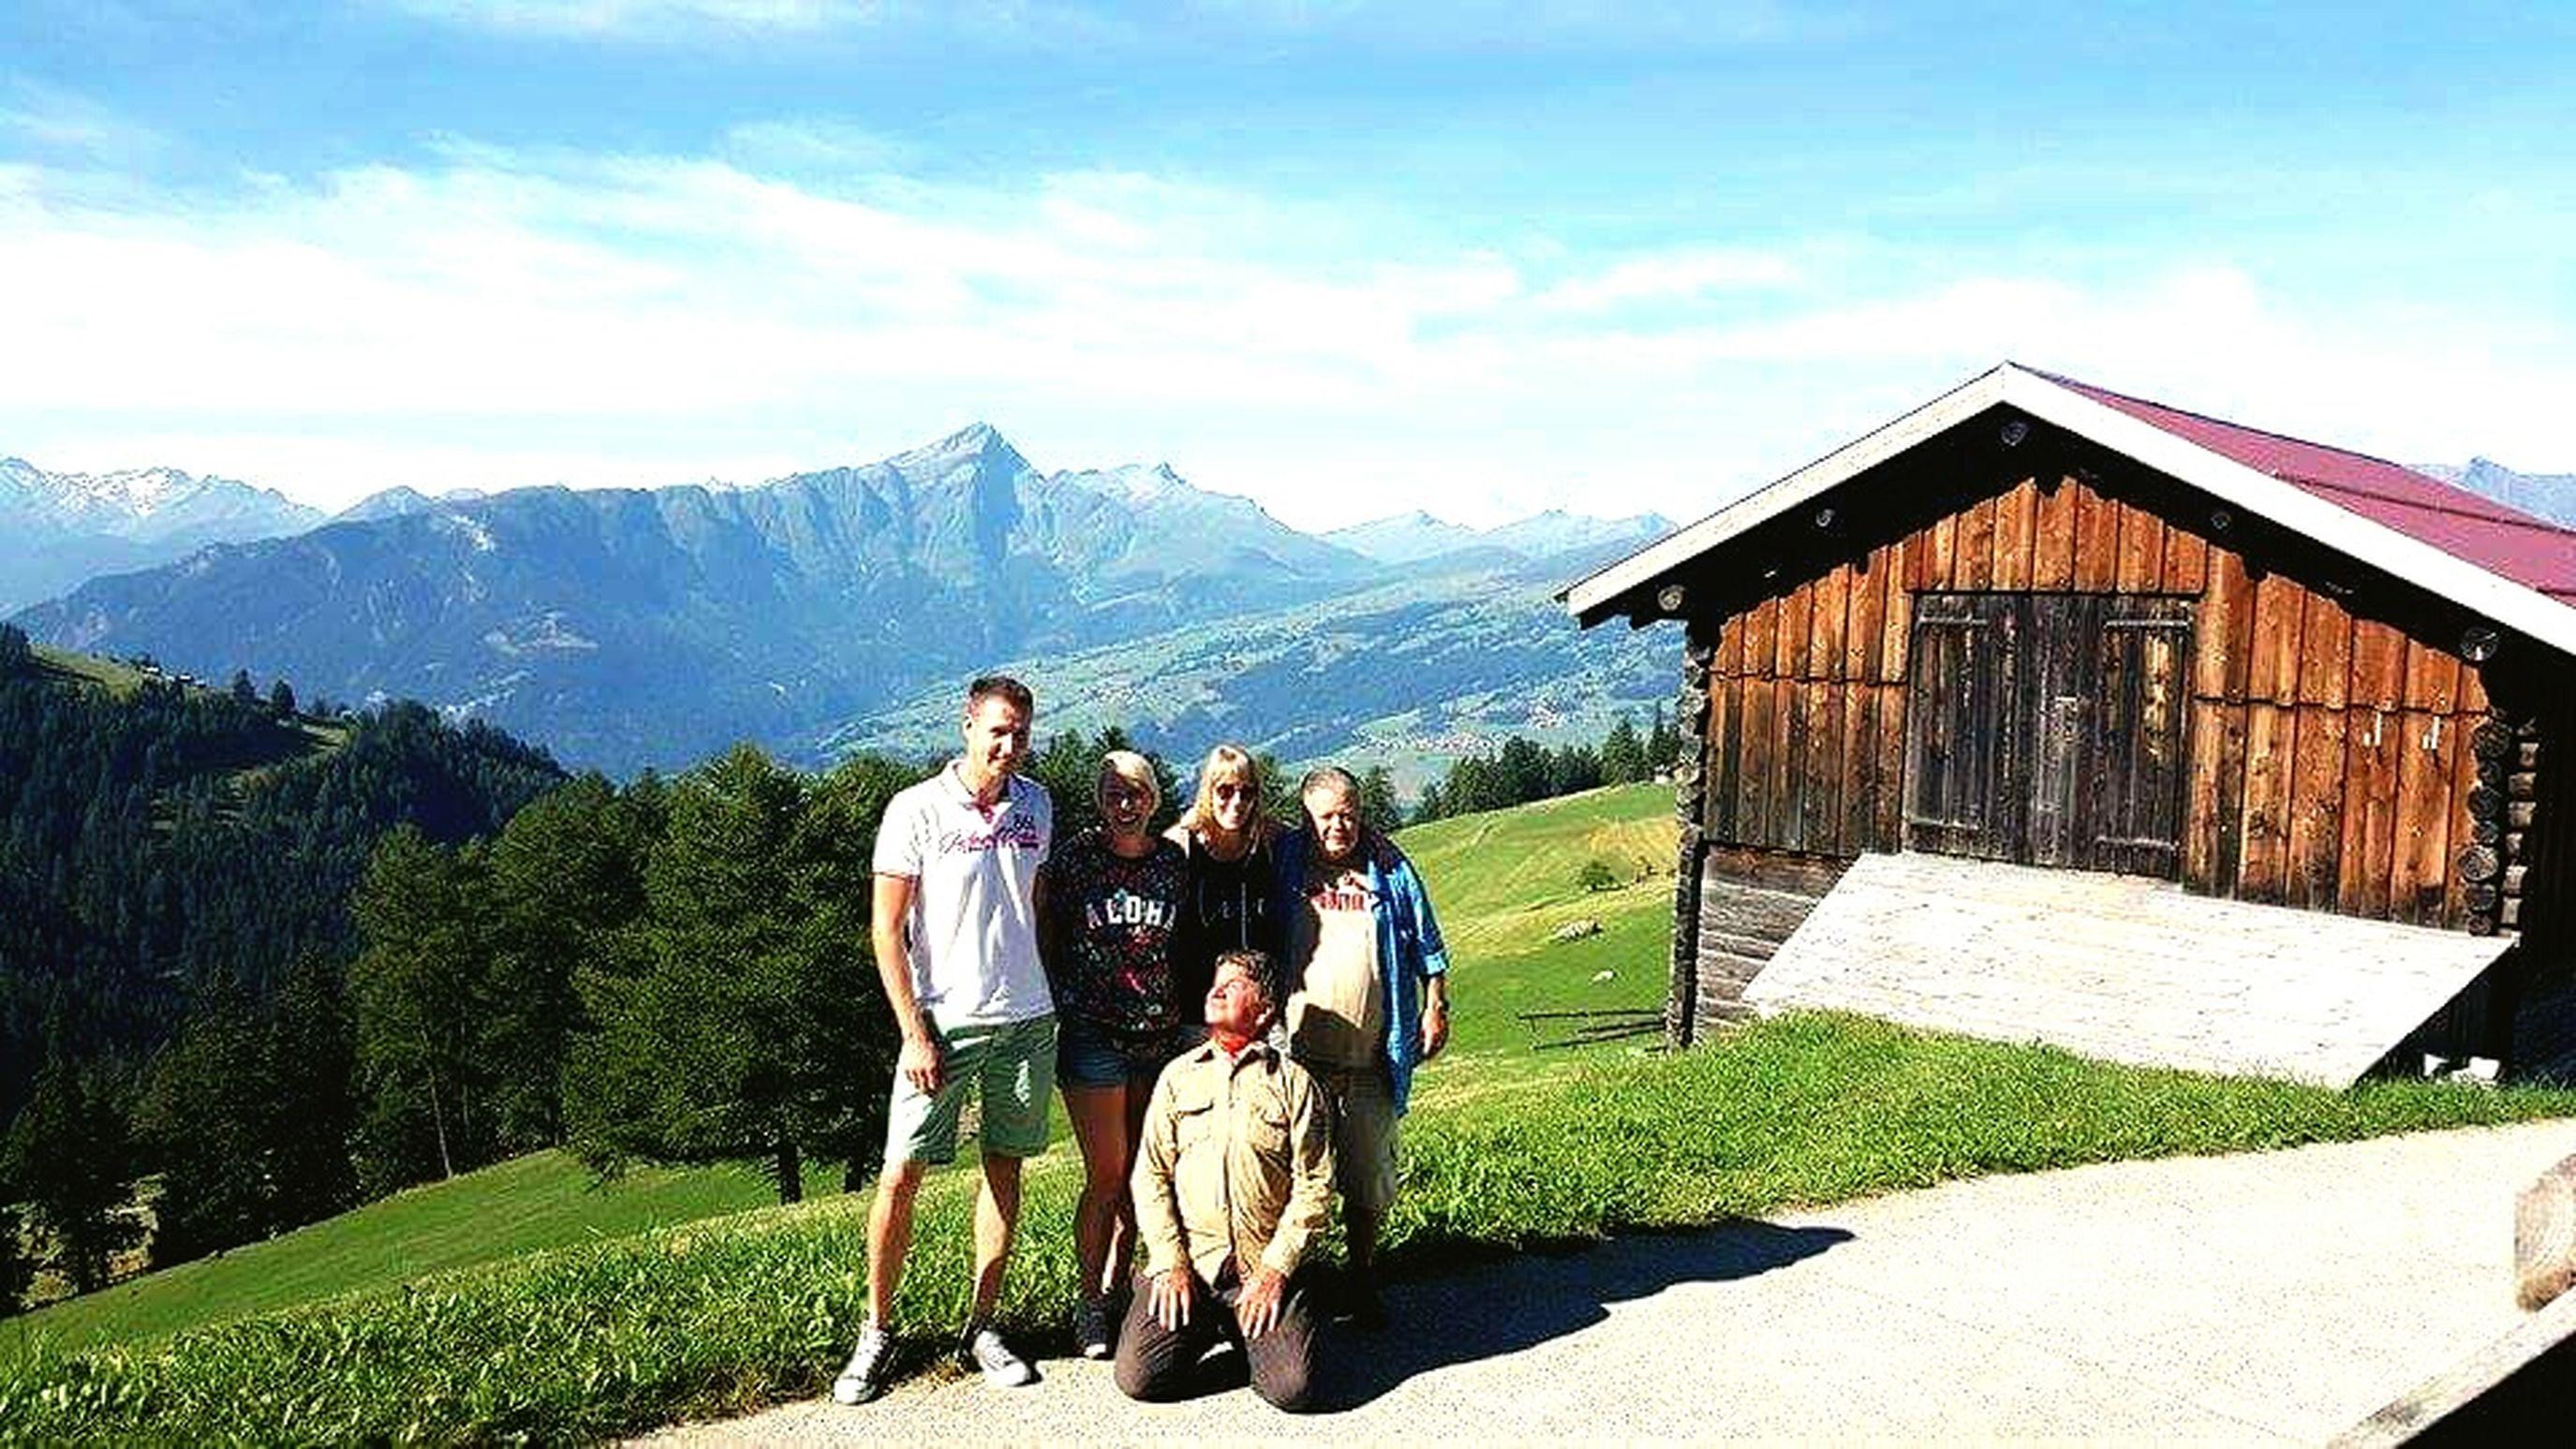 Switzerland Graubünden Maiensäss Mountain View Friends And Family Beautiful Nature Happy People Nature Summer